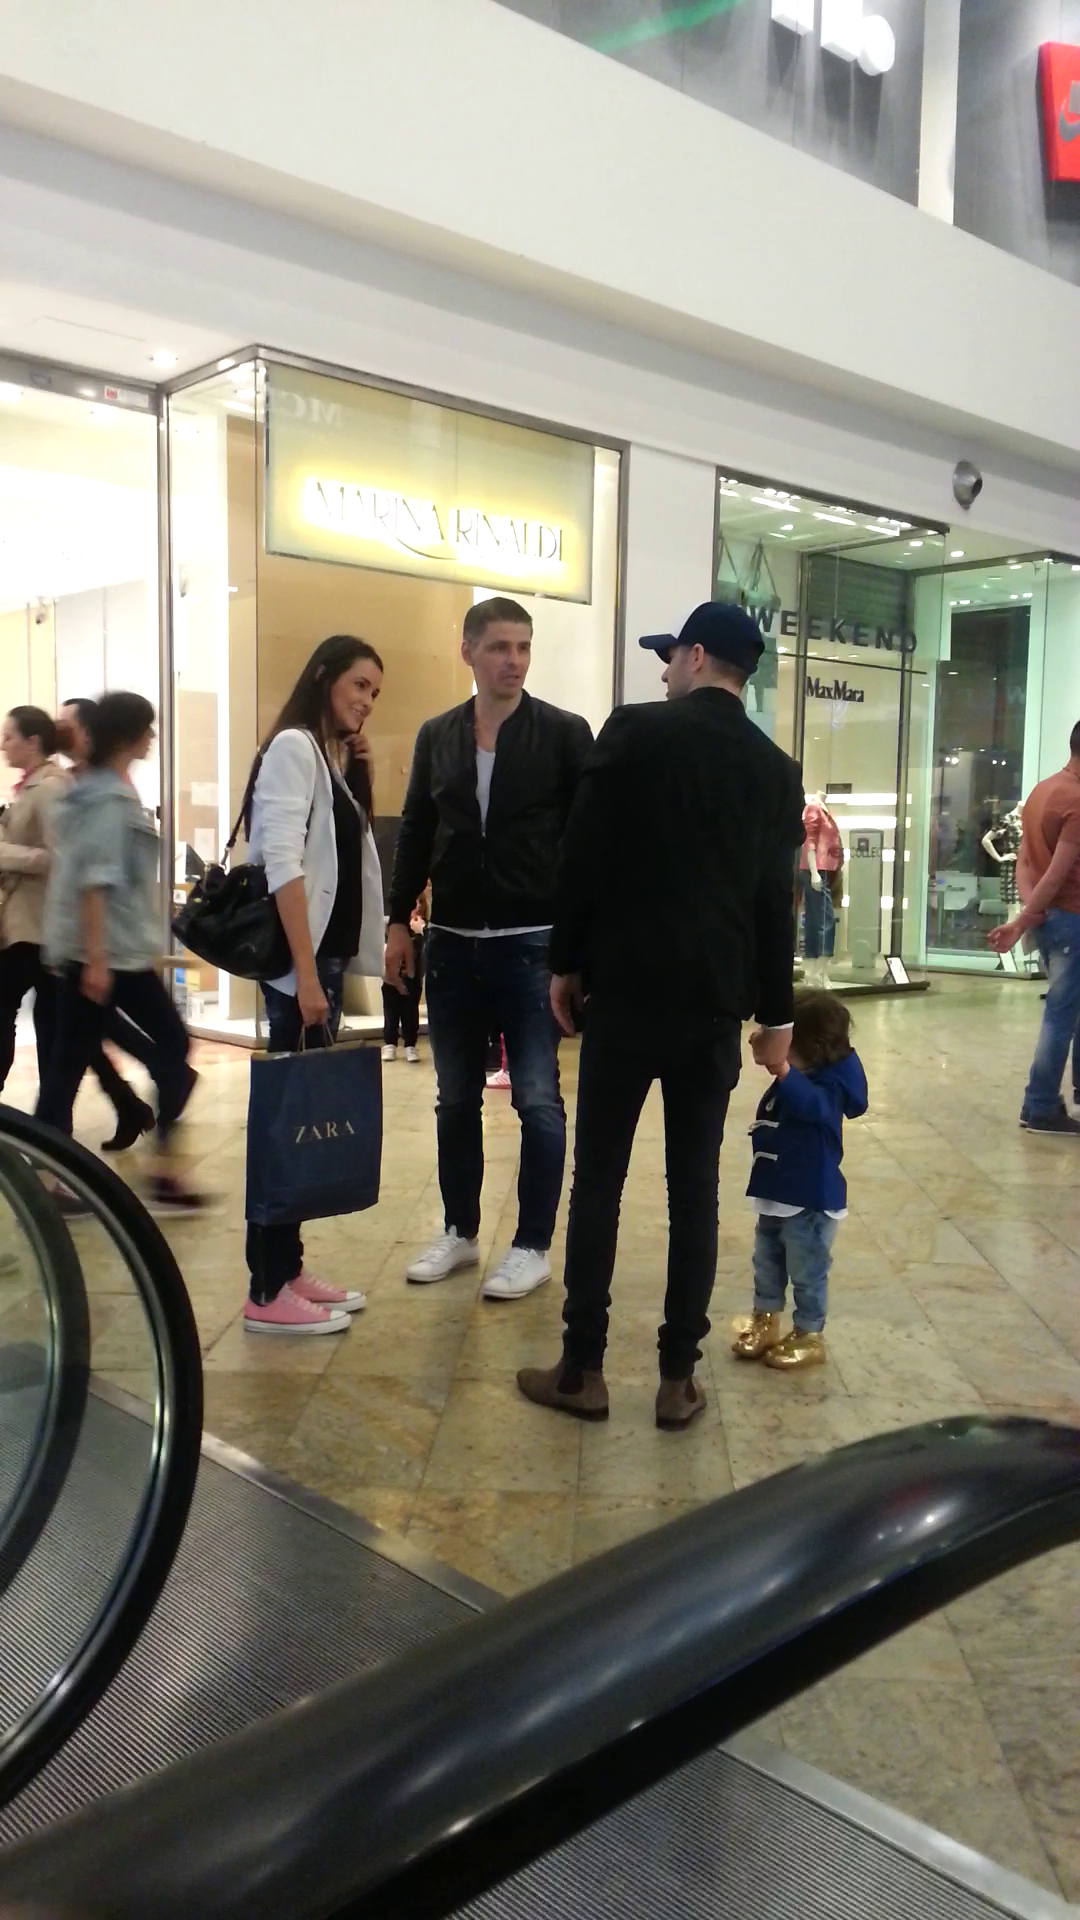 La plimbare cu micutul Noah prin mall, Adi Sana se intalneste cu niste prieteni